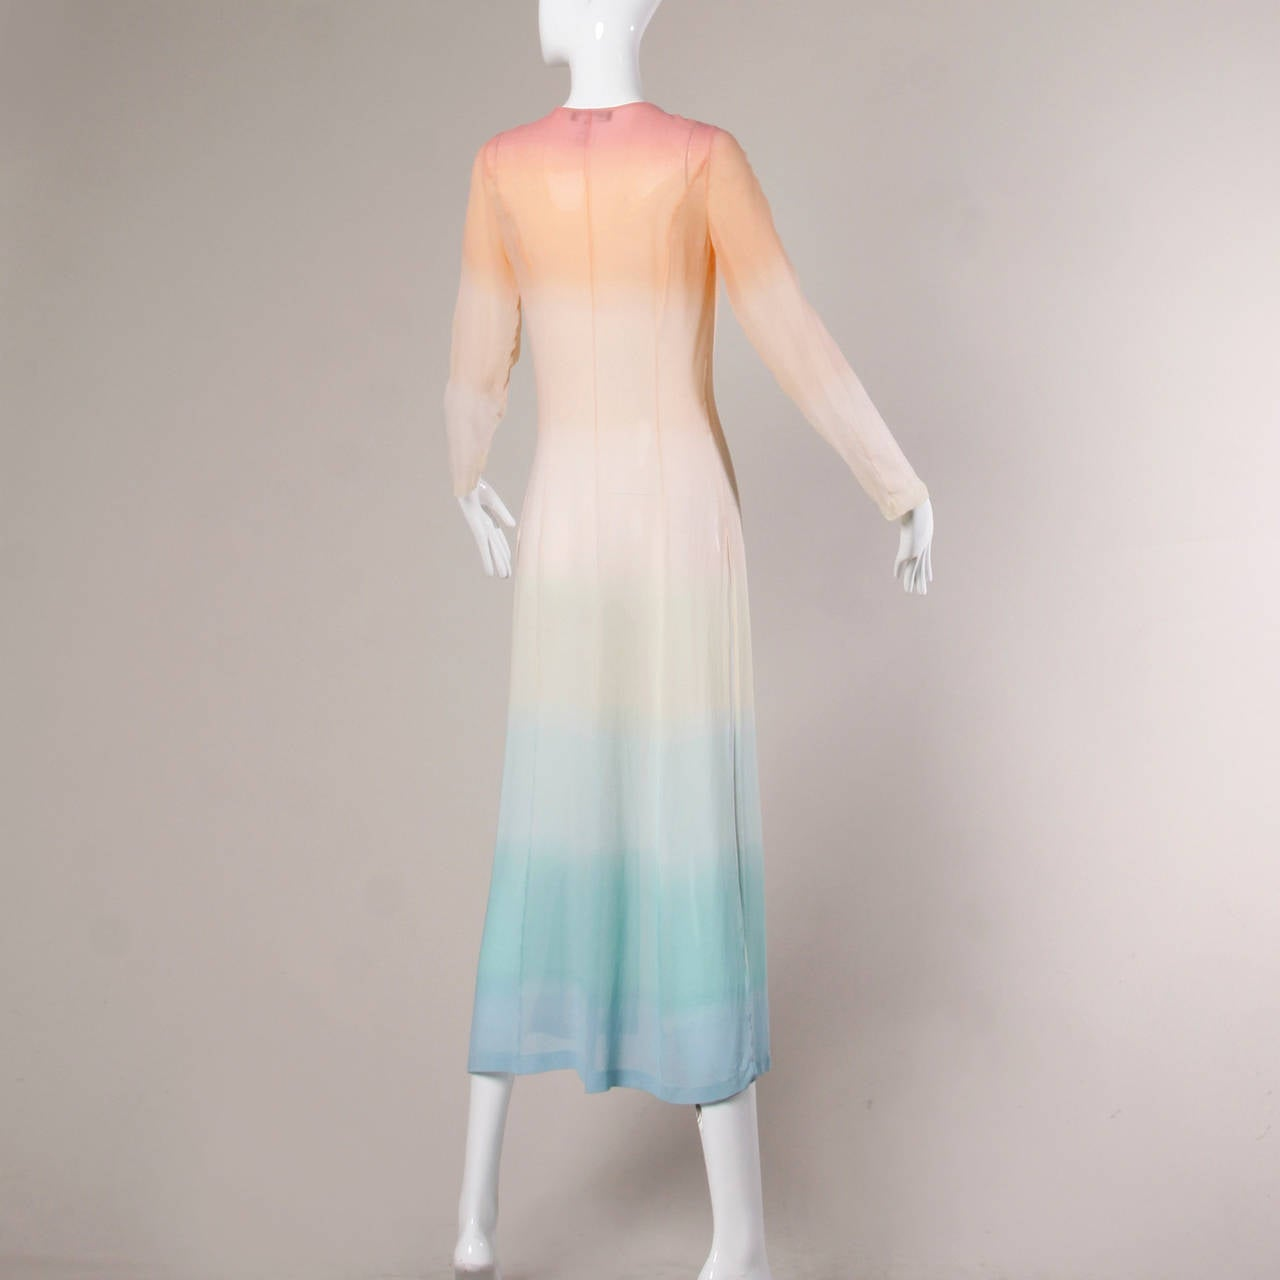 Louis Feraud Vintage Ombre Silk Kimono Duster or Maxi Coat 5